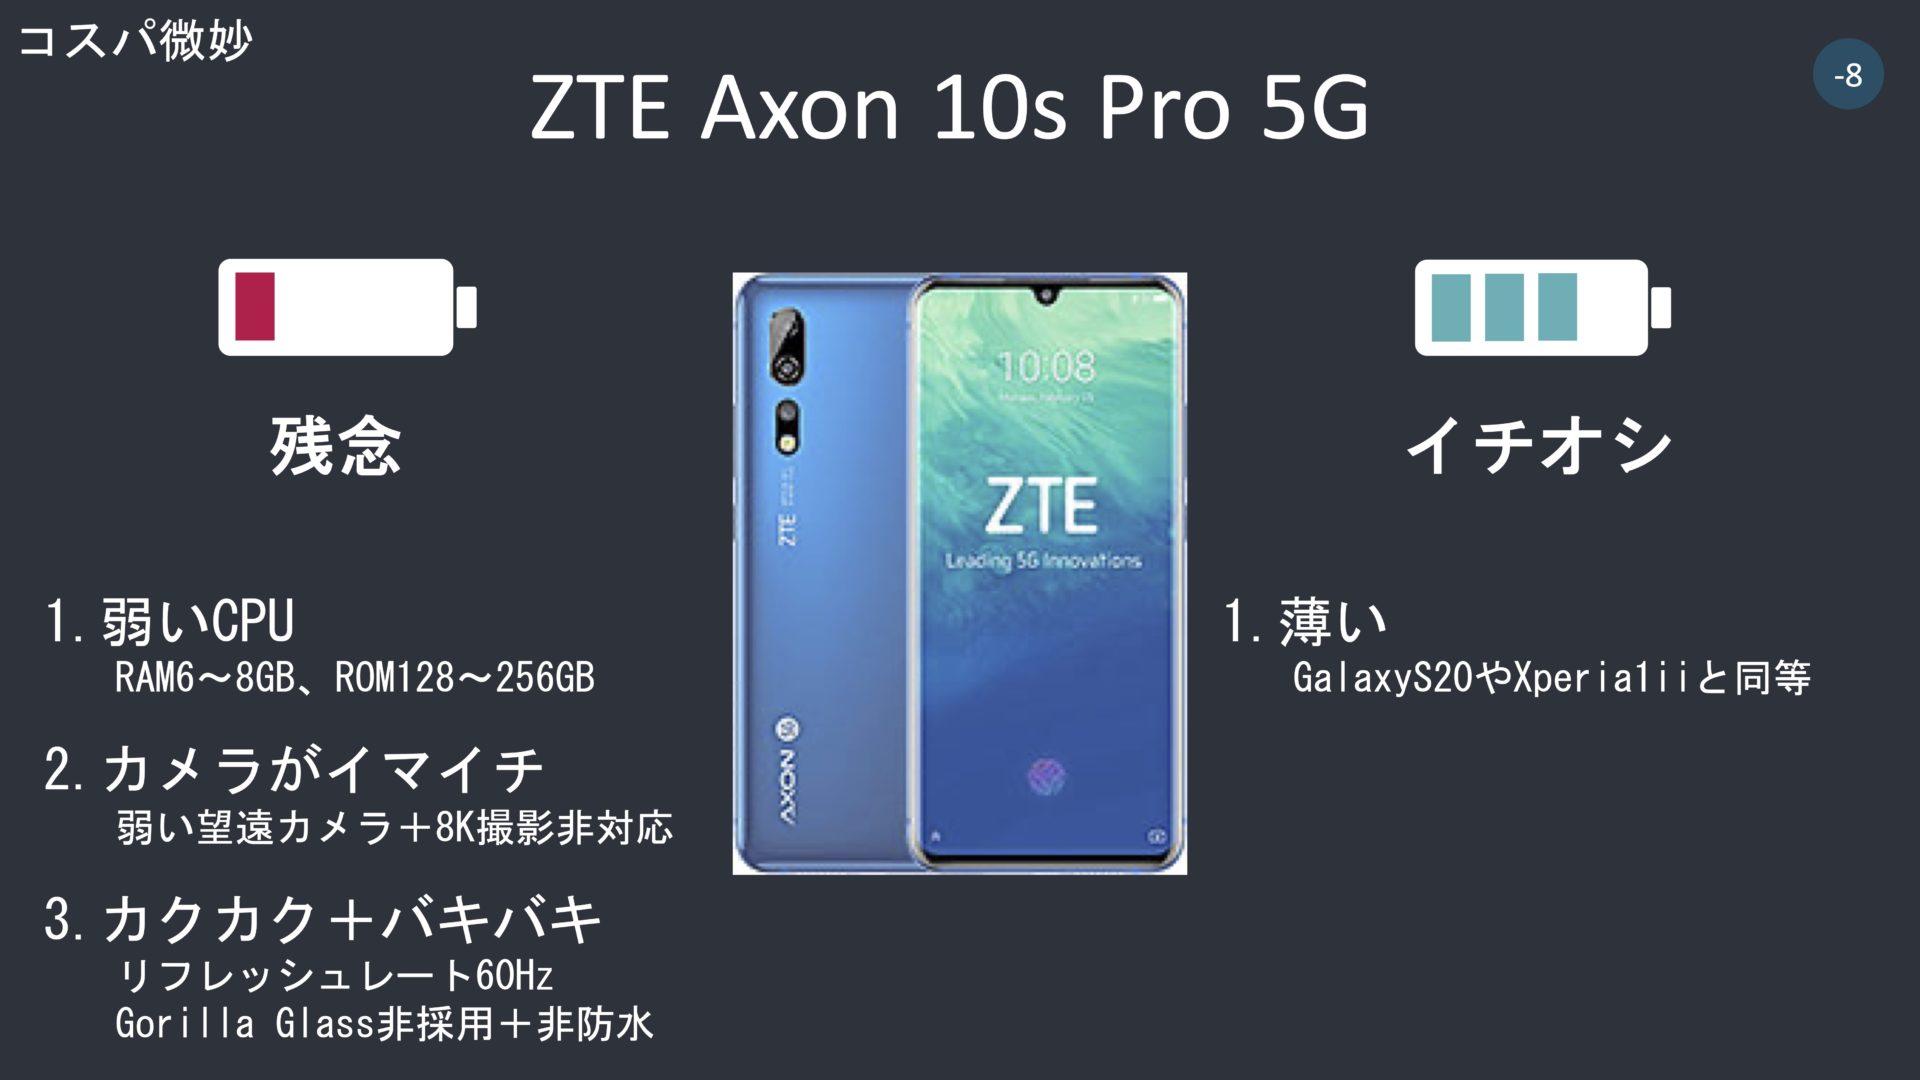 zte_axon_10s_pro